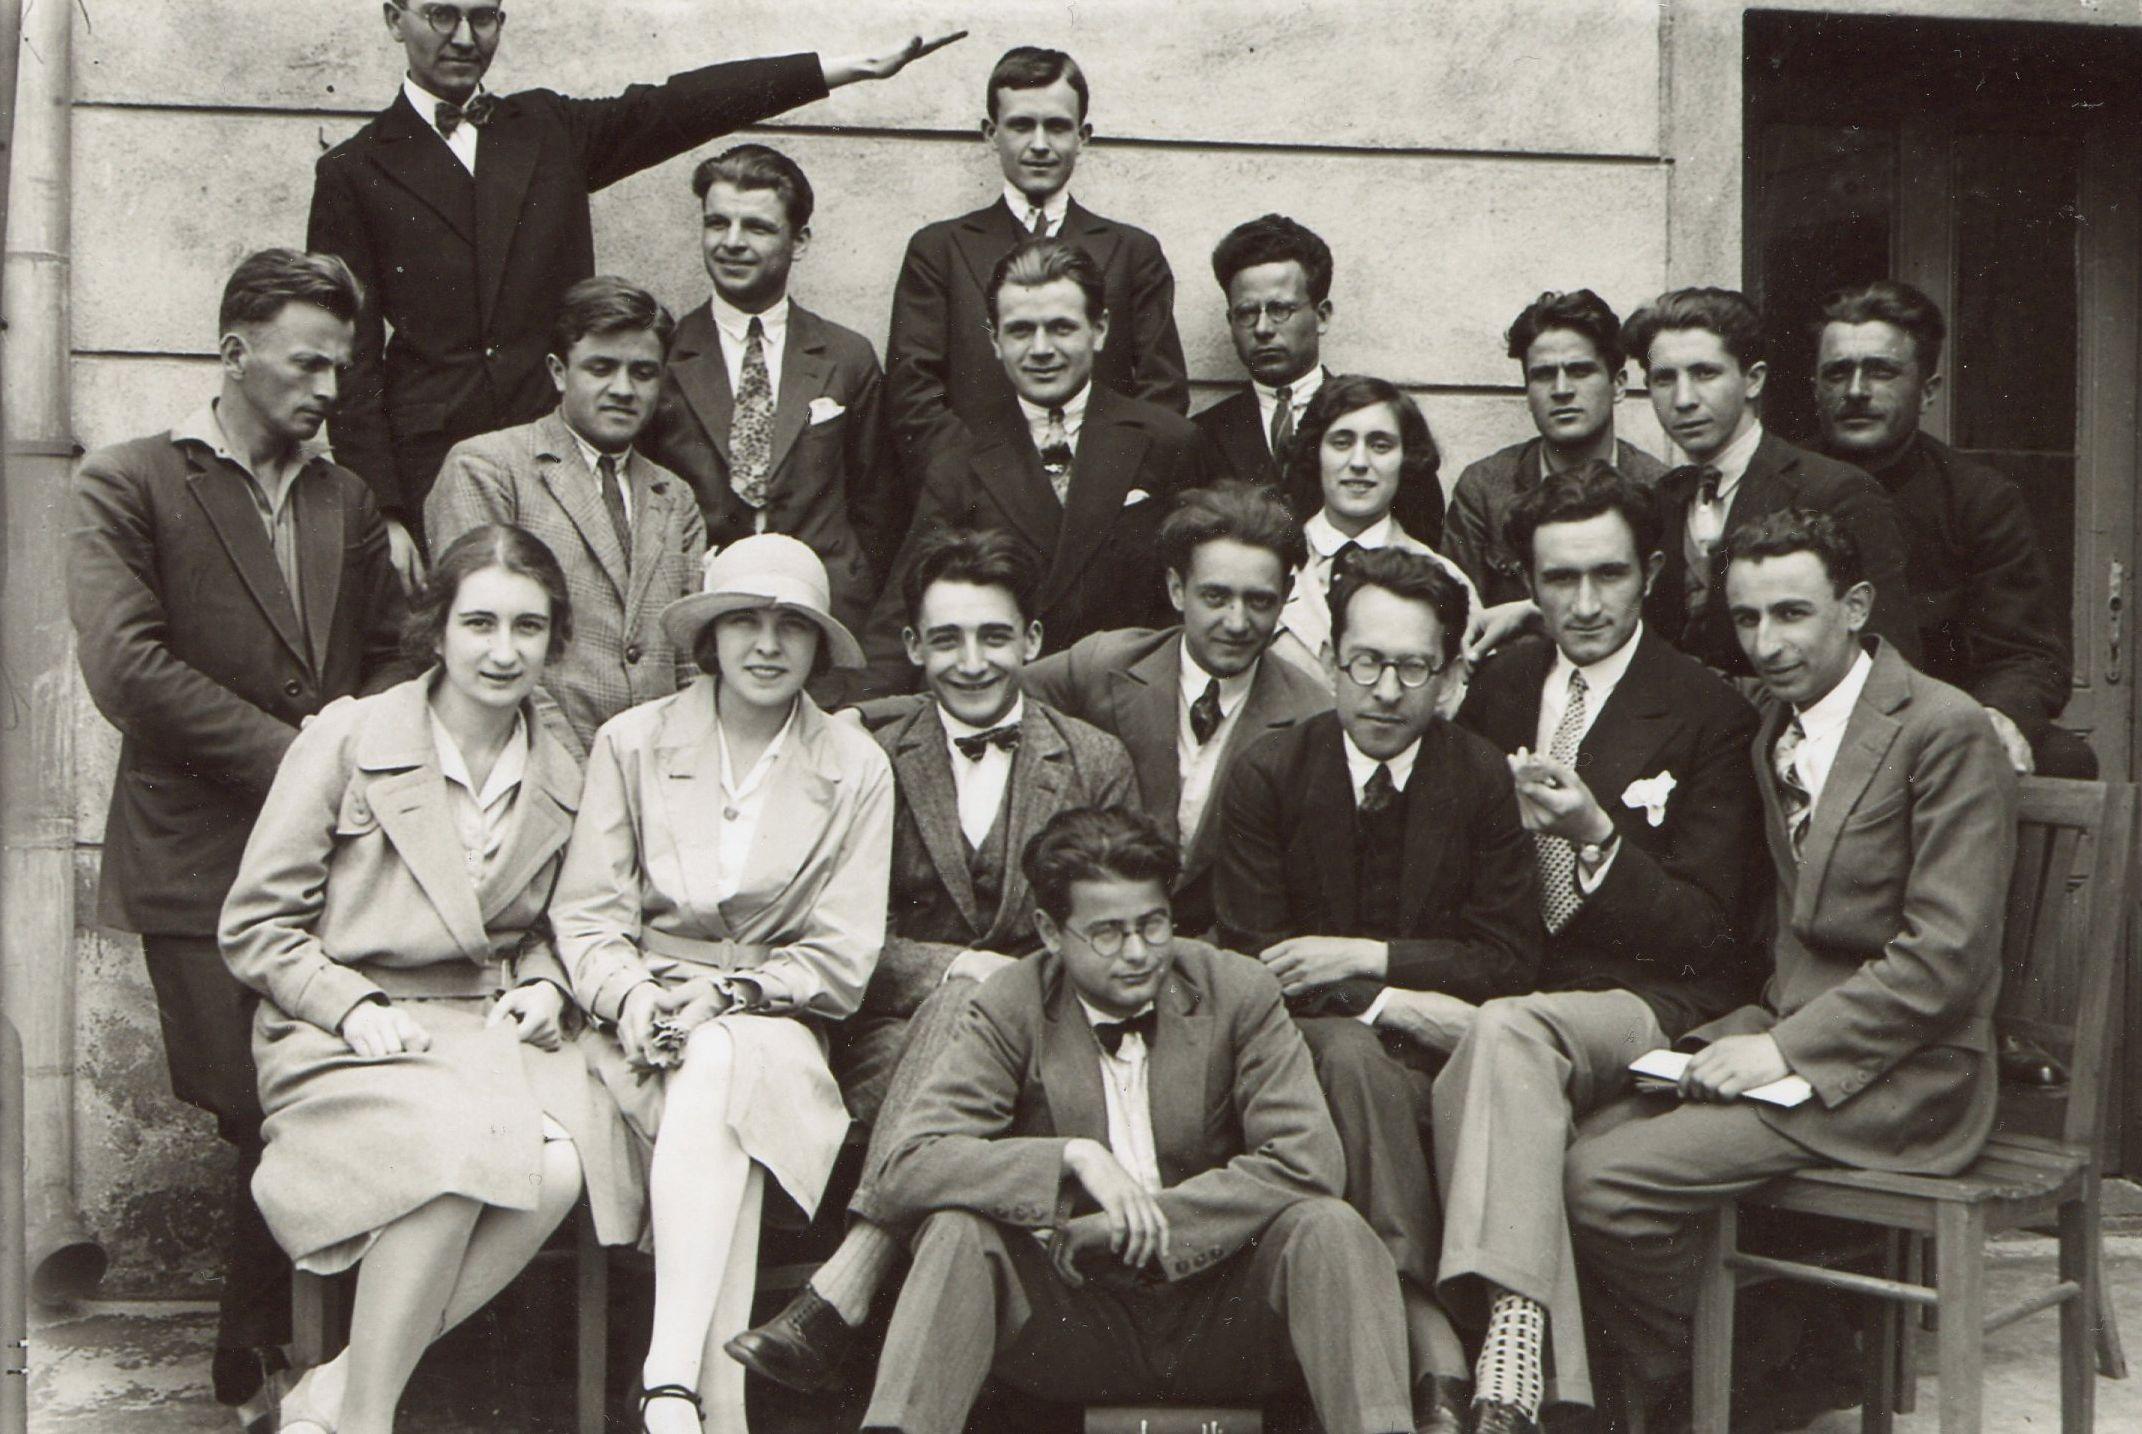 Доц Бешевлиев със студенти – 1930 г.